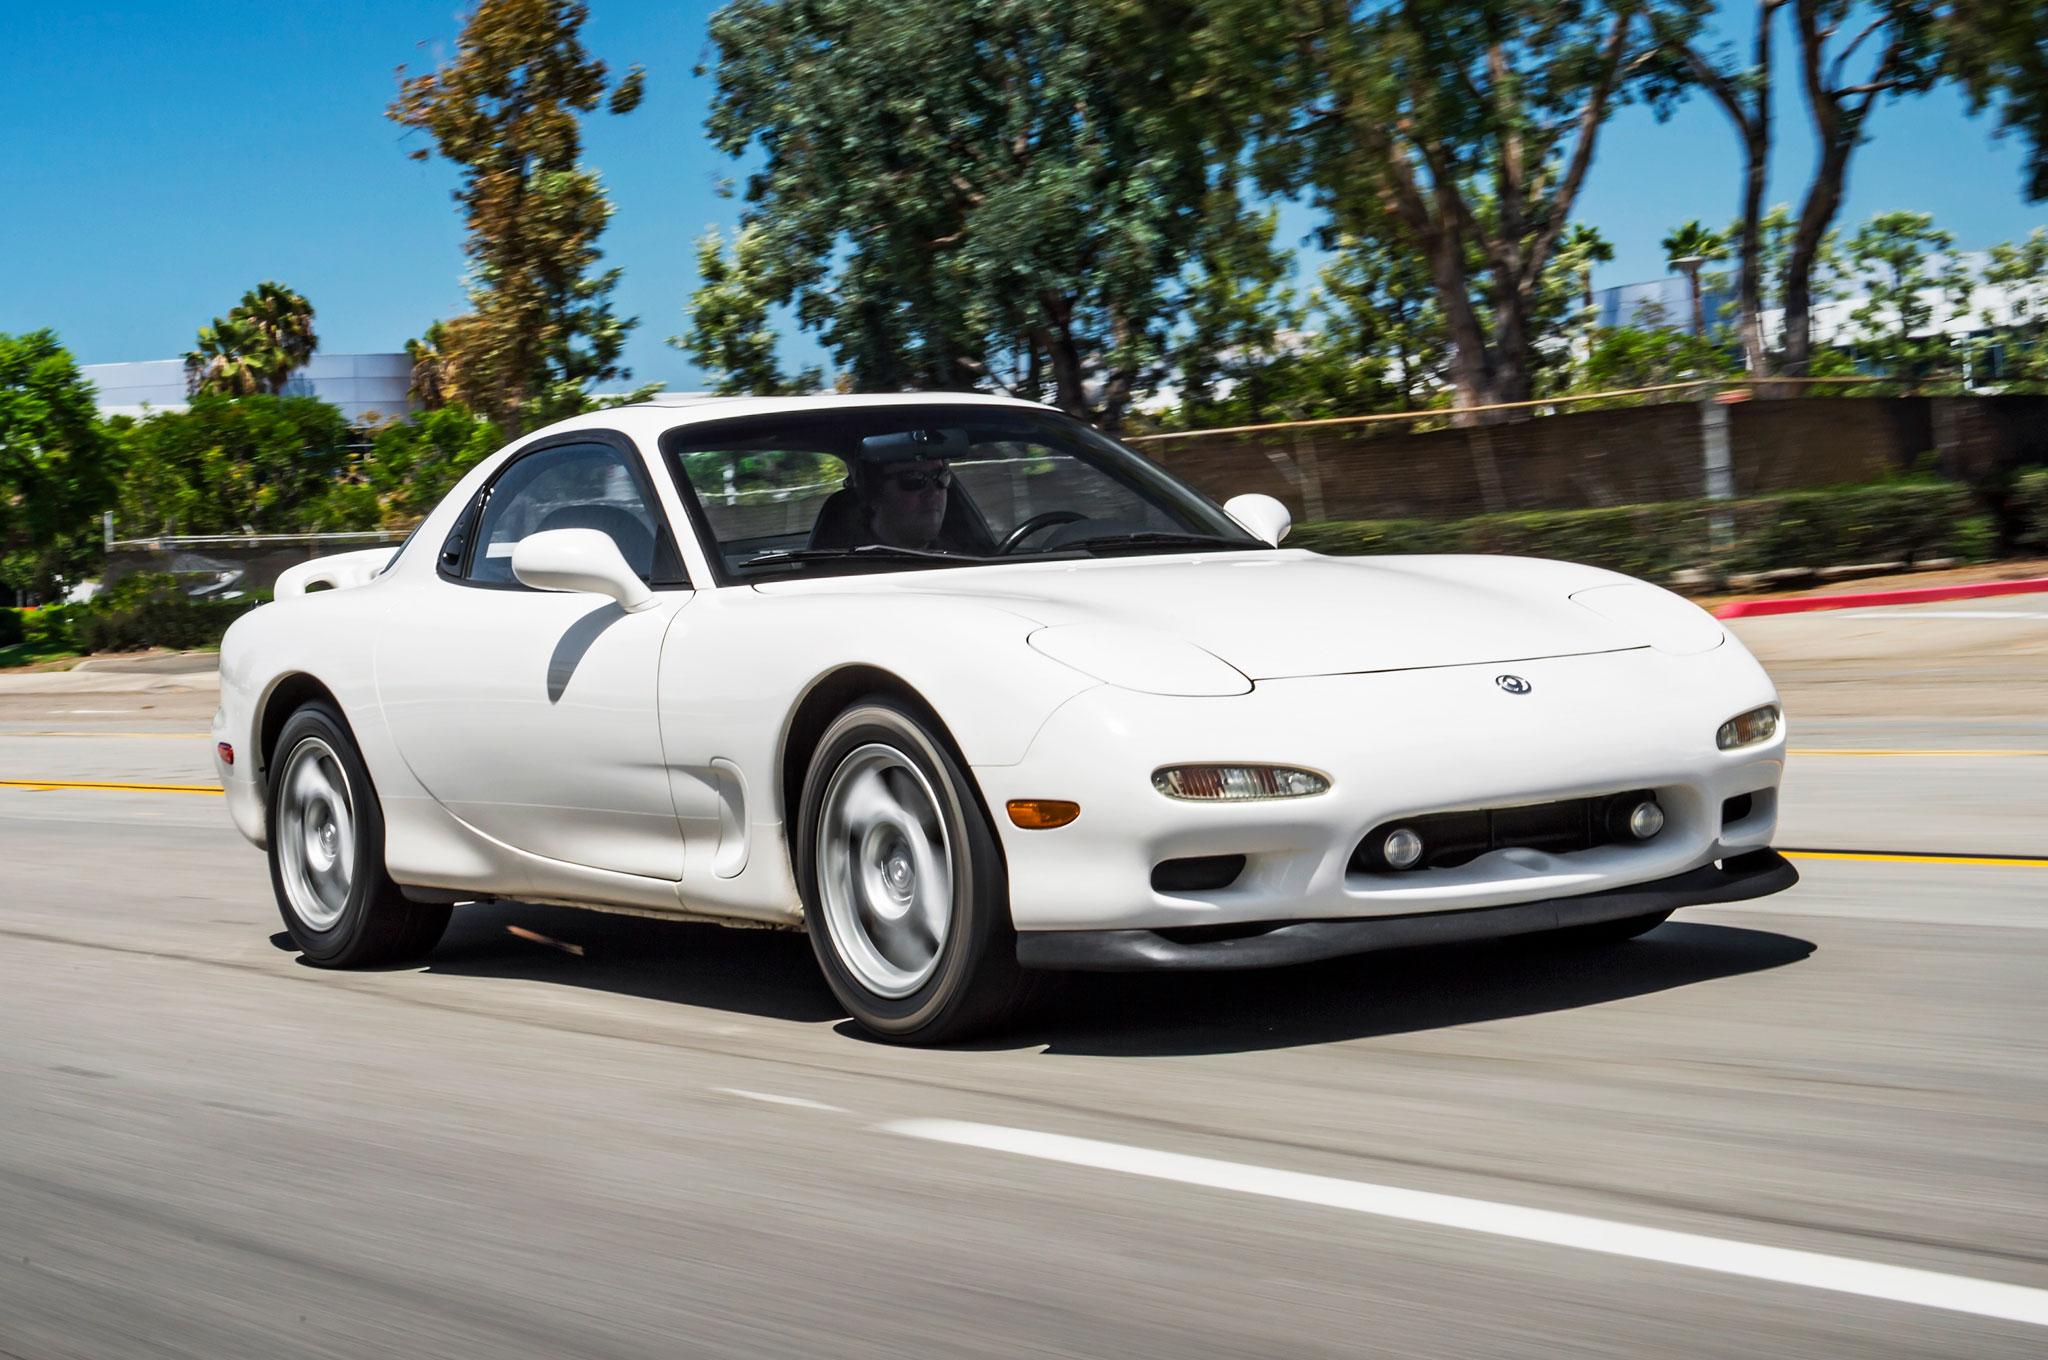 Kelebihan Kekurangan Mazda 1995 Review